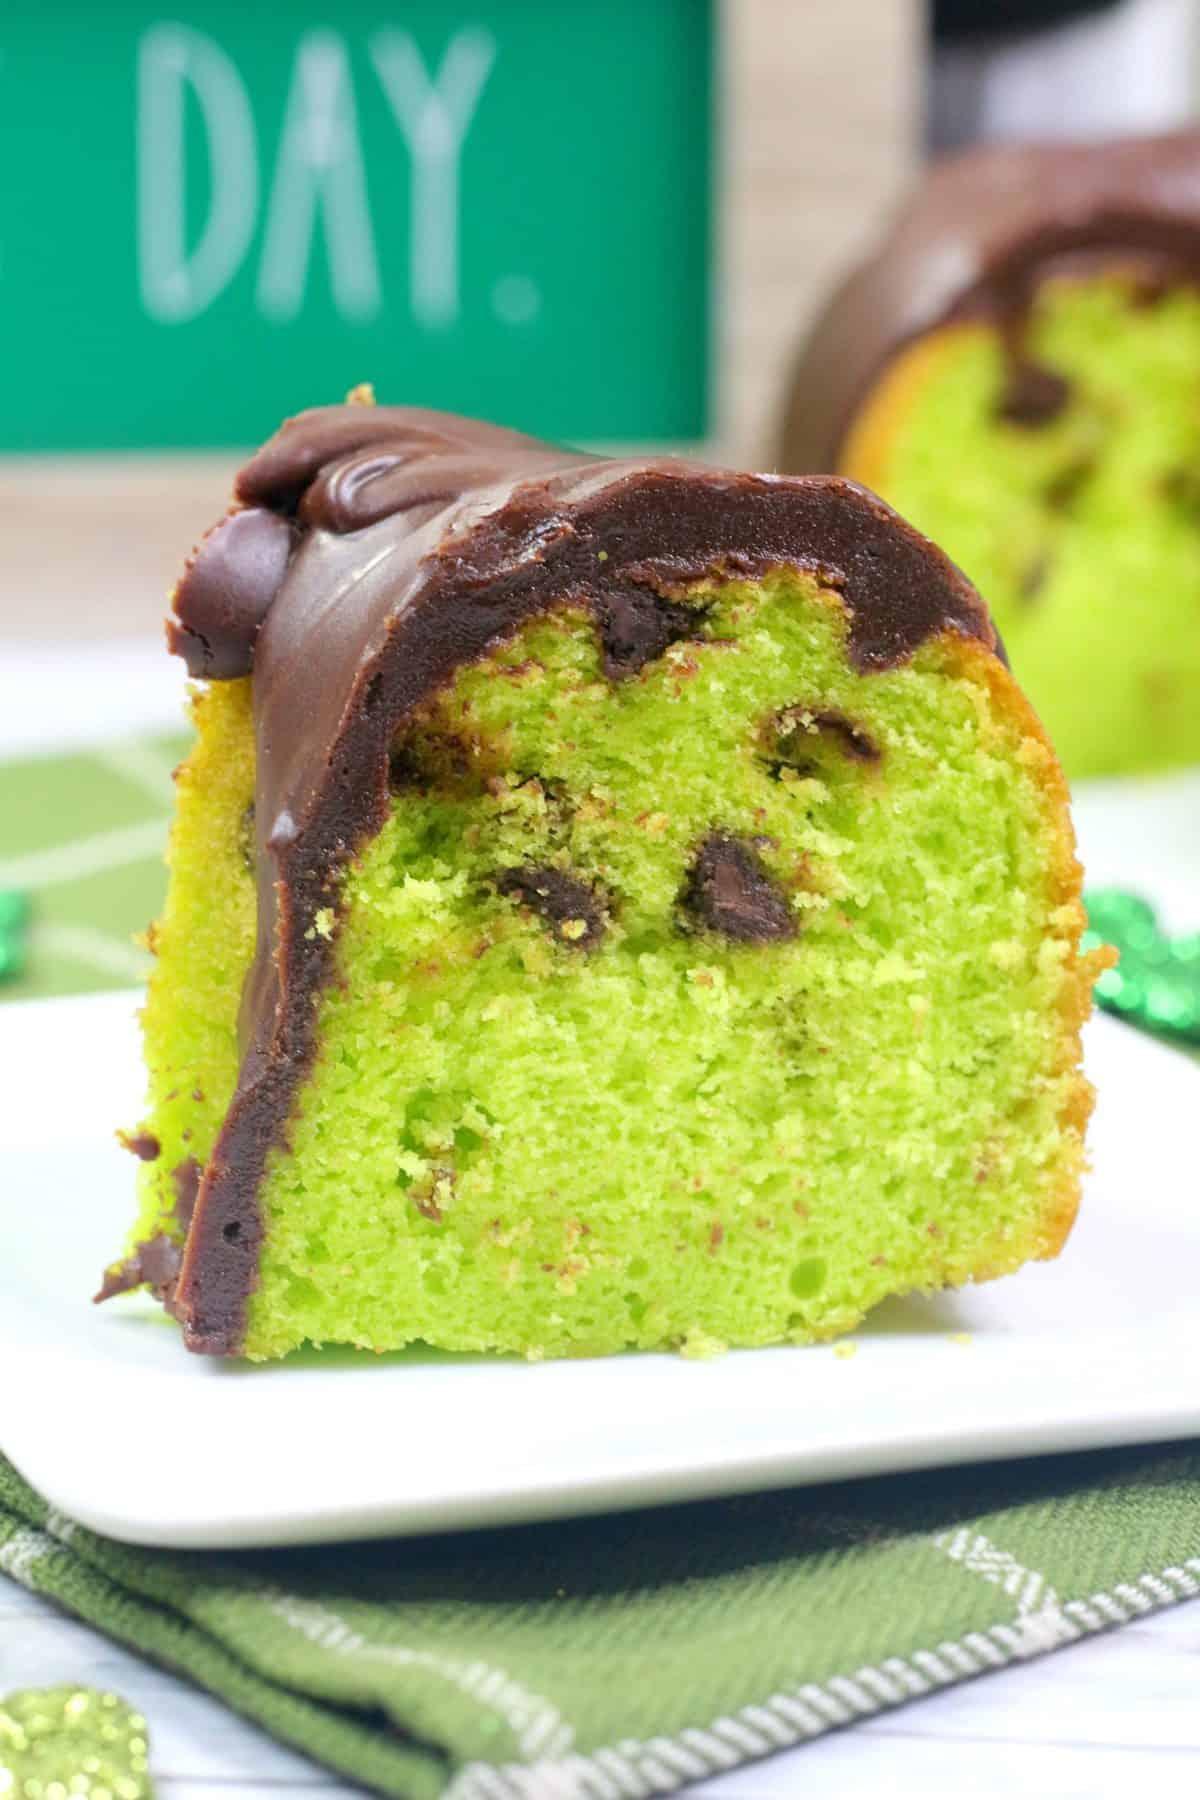 St Patricks Day dessert, mint chocolate chip cake